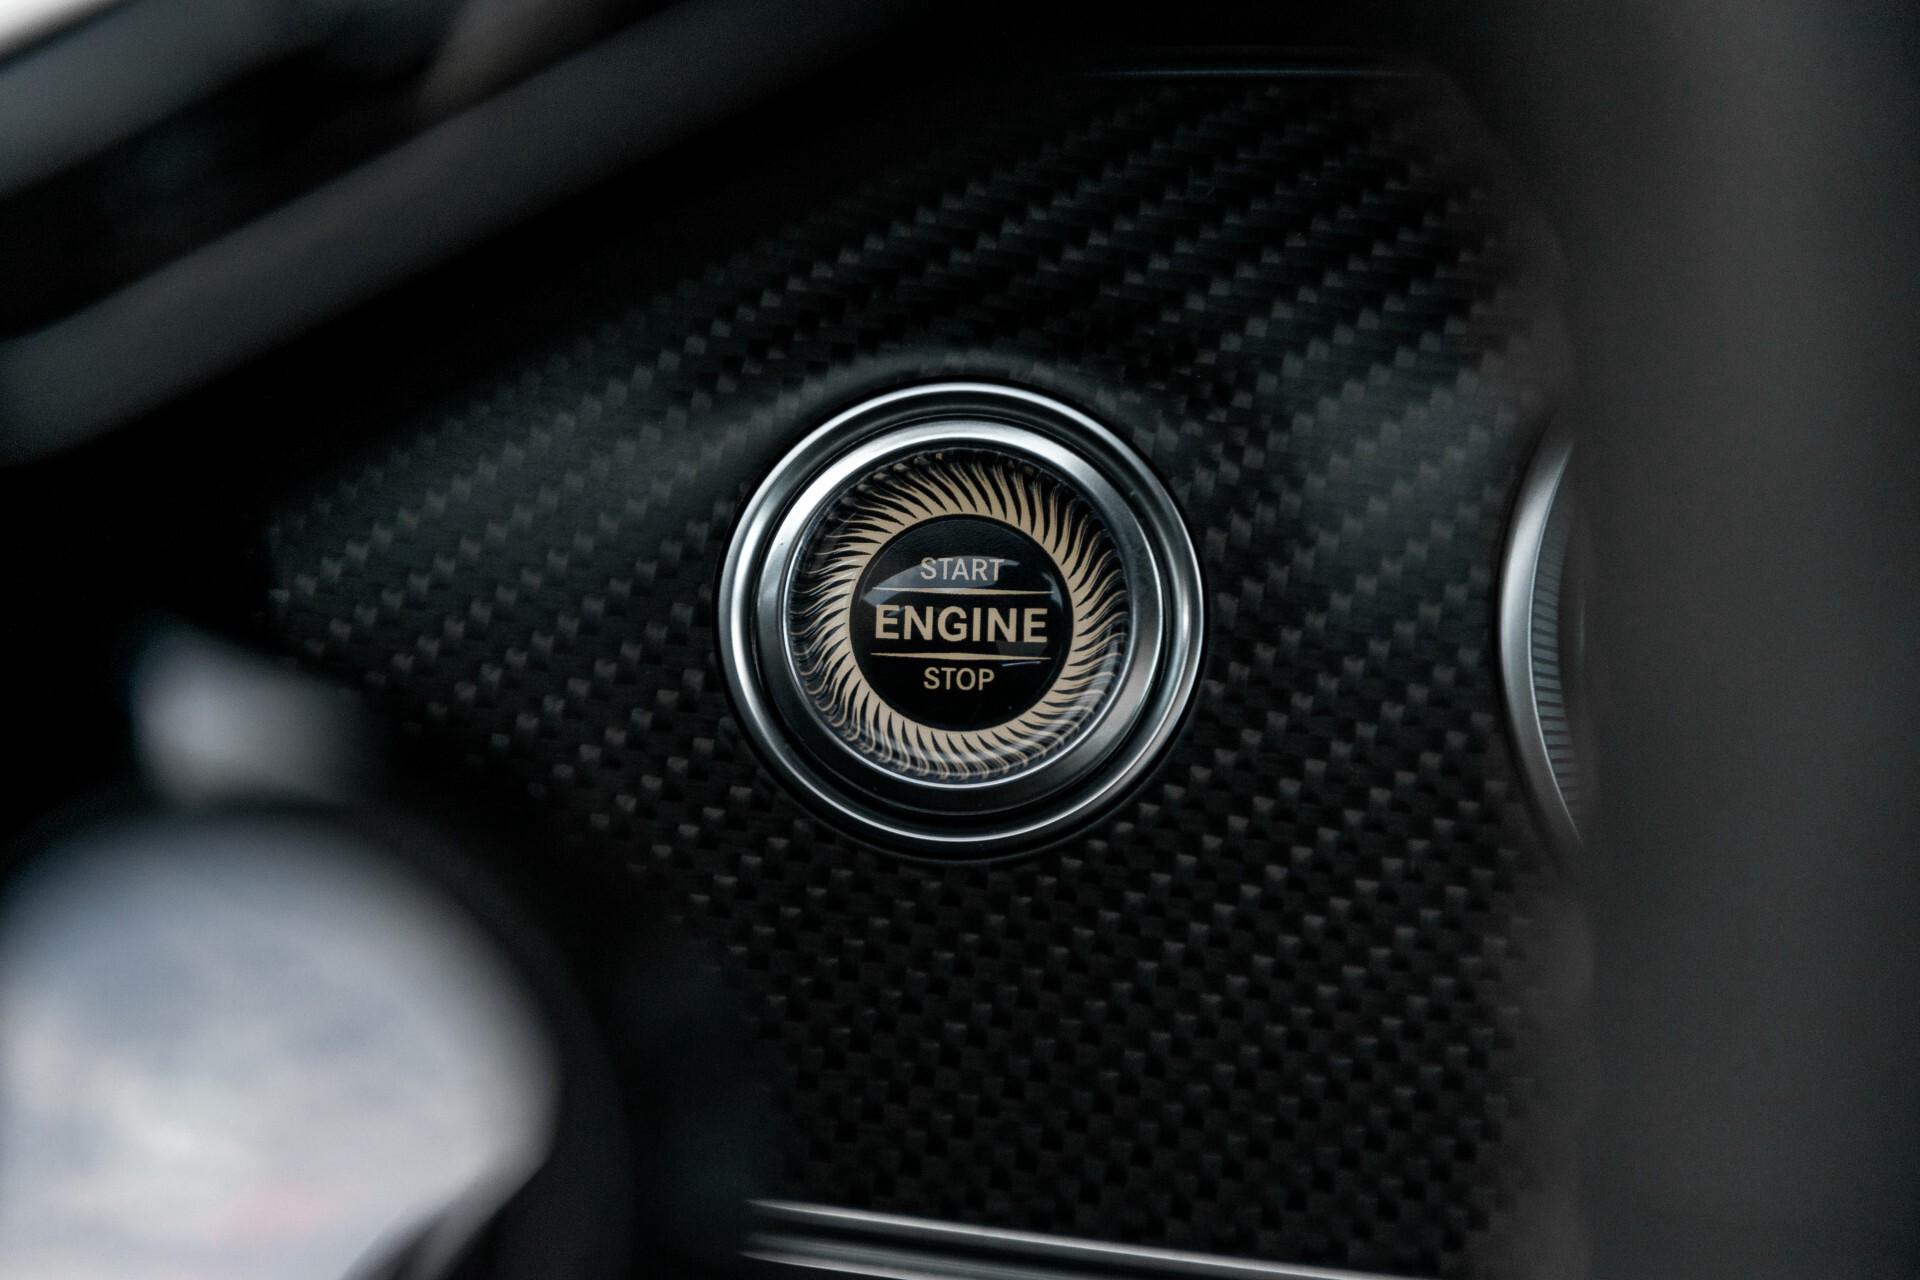 Mercedes-Benz AMG GT 4-Door Coupe 63 S 4MATIC+ Edition 1 Keramisch/Carbon/First Class/Dynamic Plus/Burmester High End 3D Aut9 Foto 44